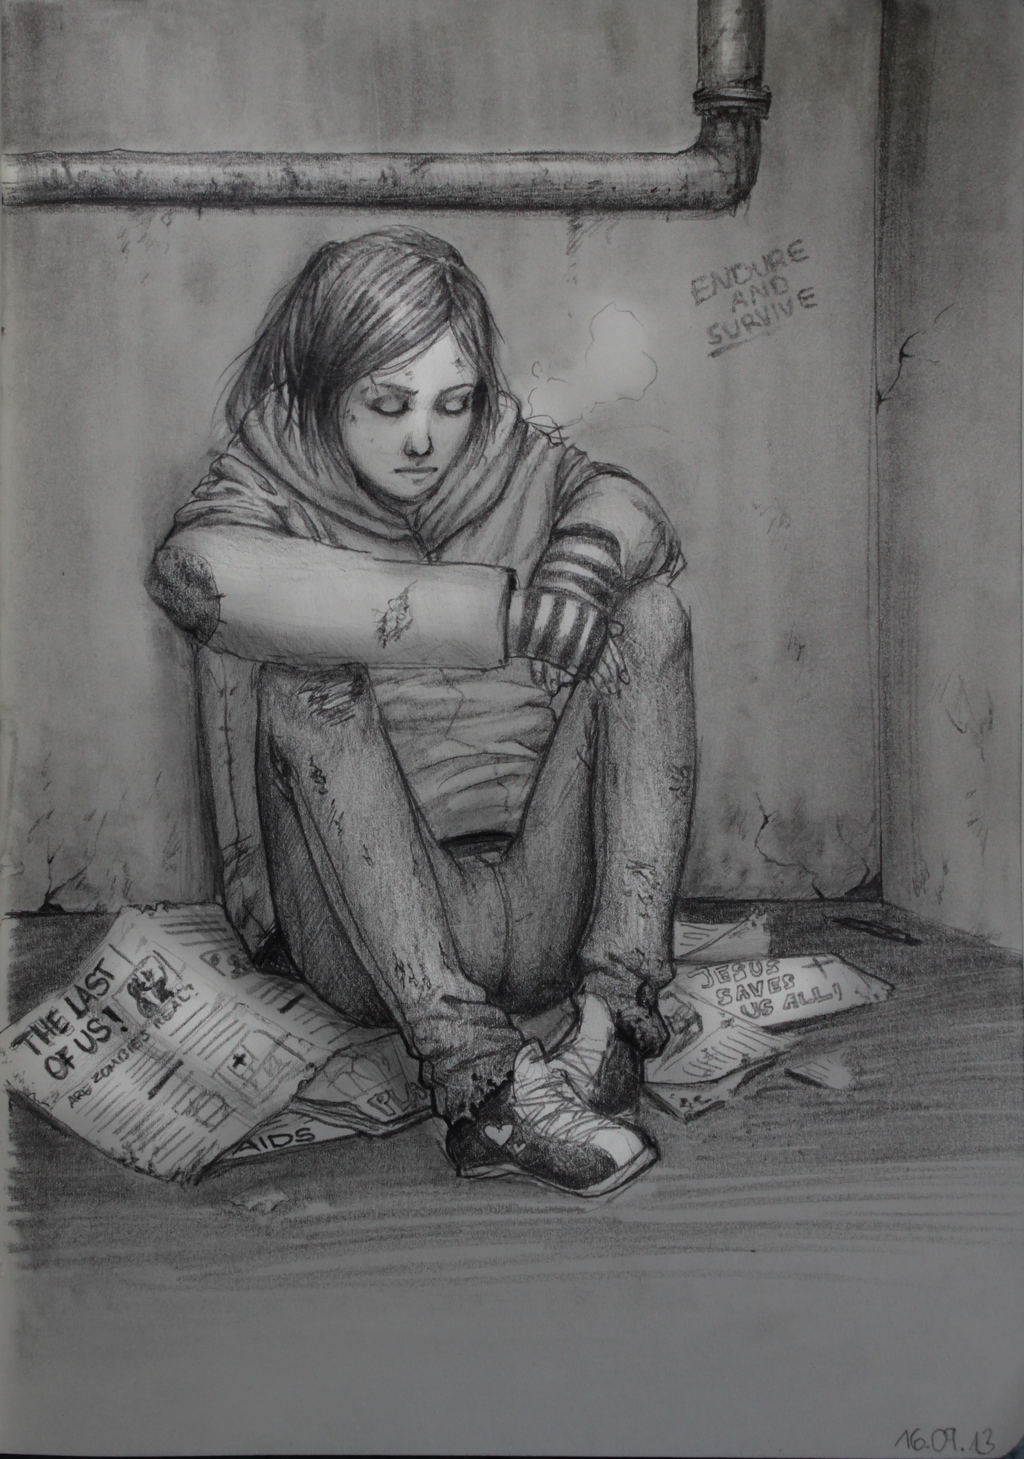 Ellie by HAZENHYTE